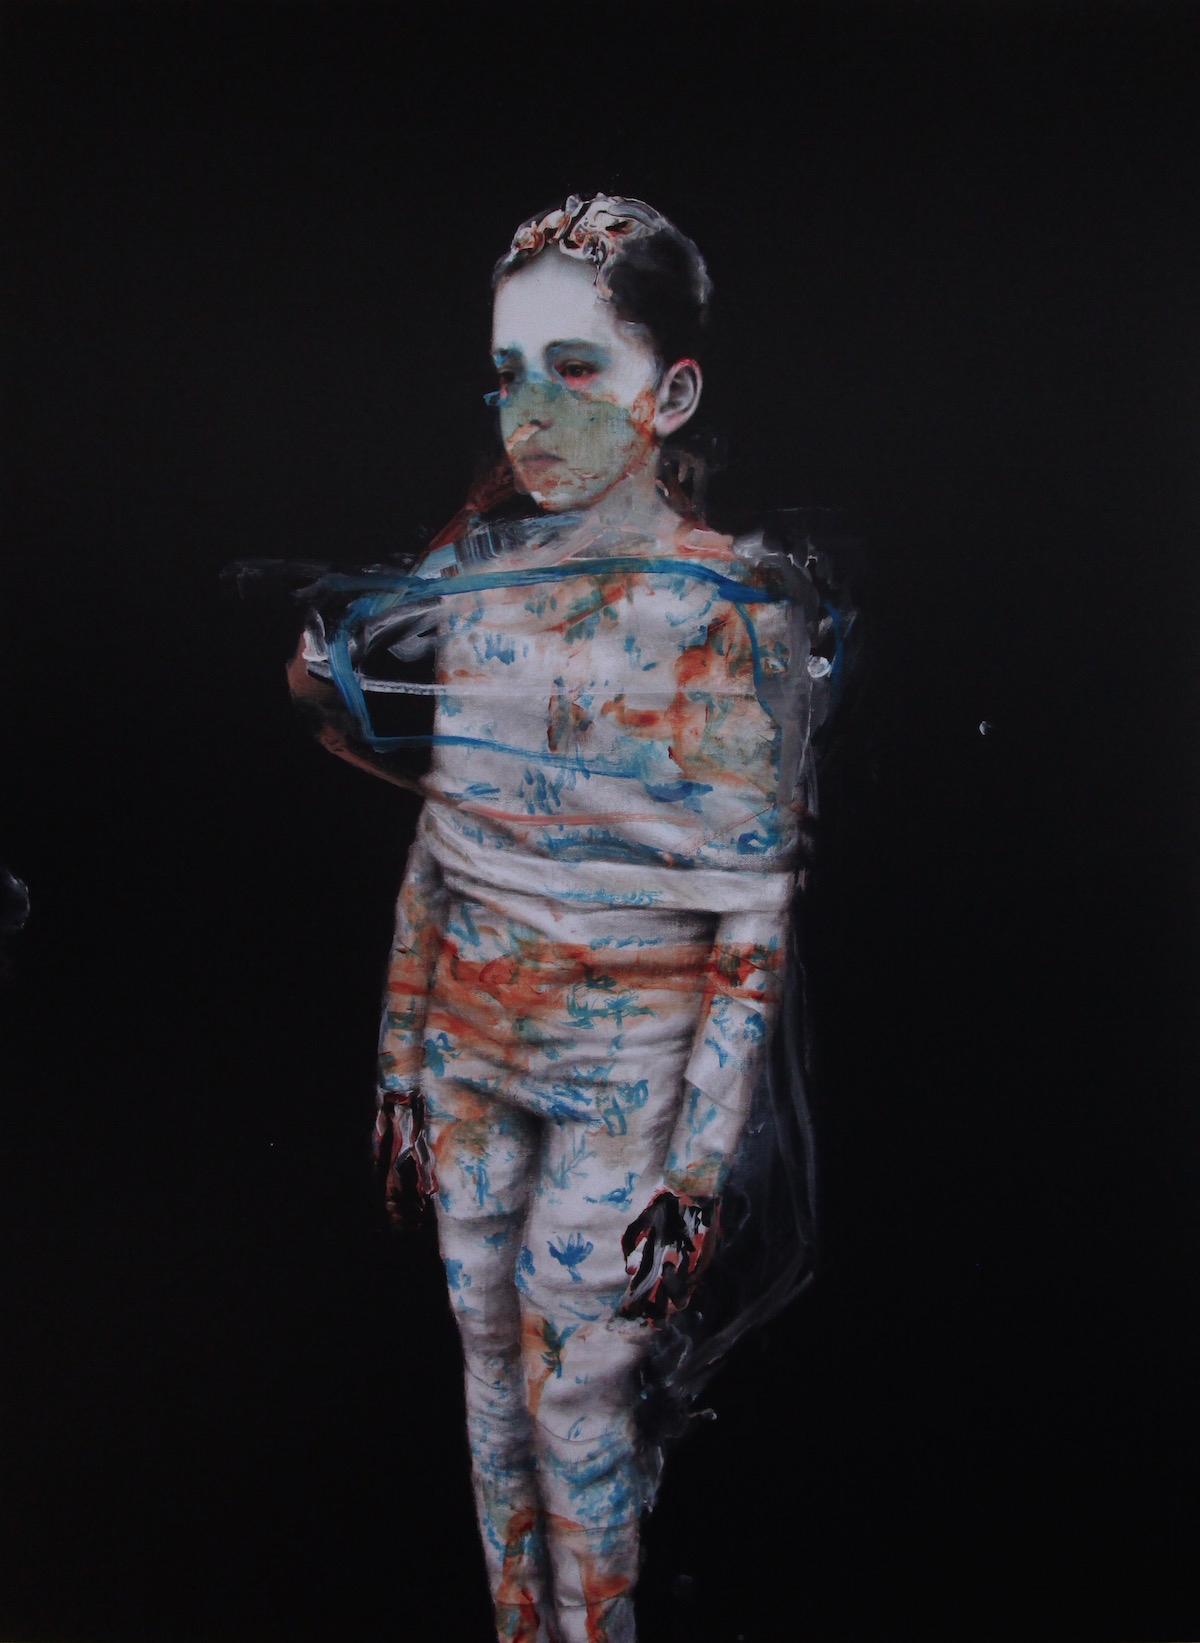 Antoine Cordet canvas toile peinture painting portrait art artist artiste peintre acrylic windows 98